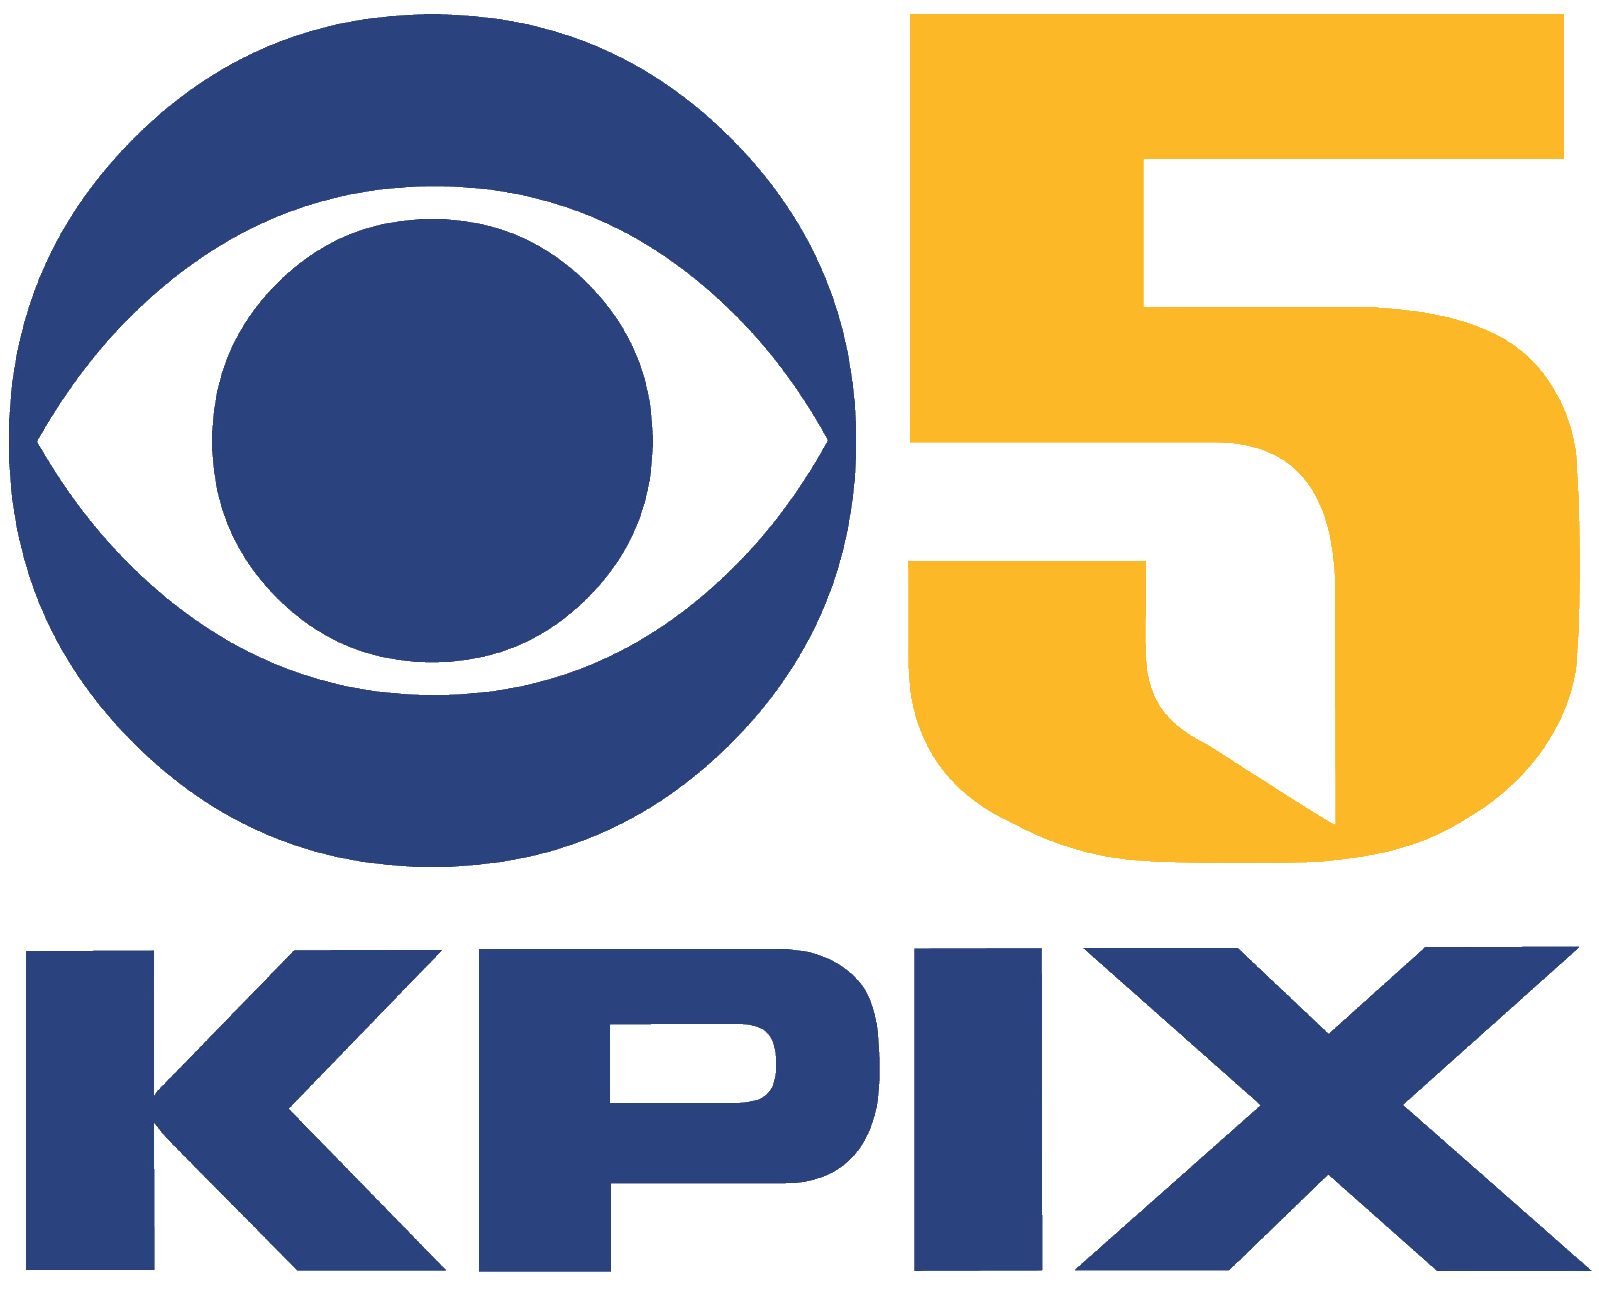 KPIX-TV_Logo.png